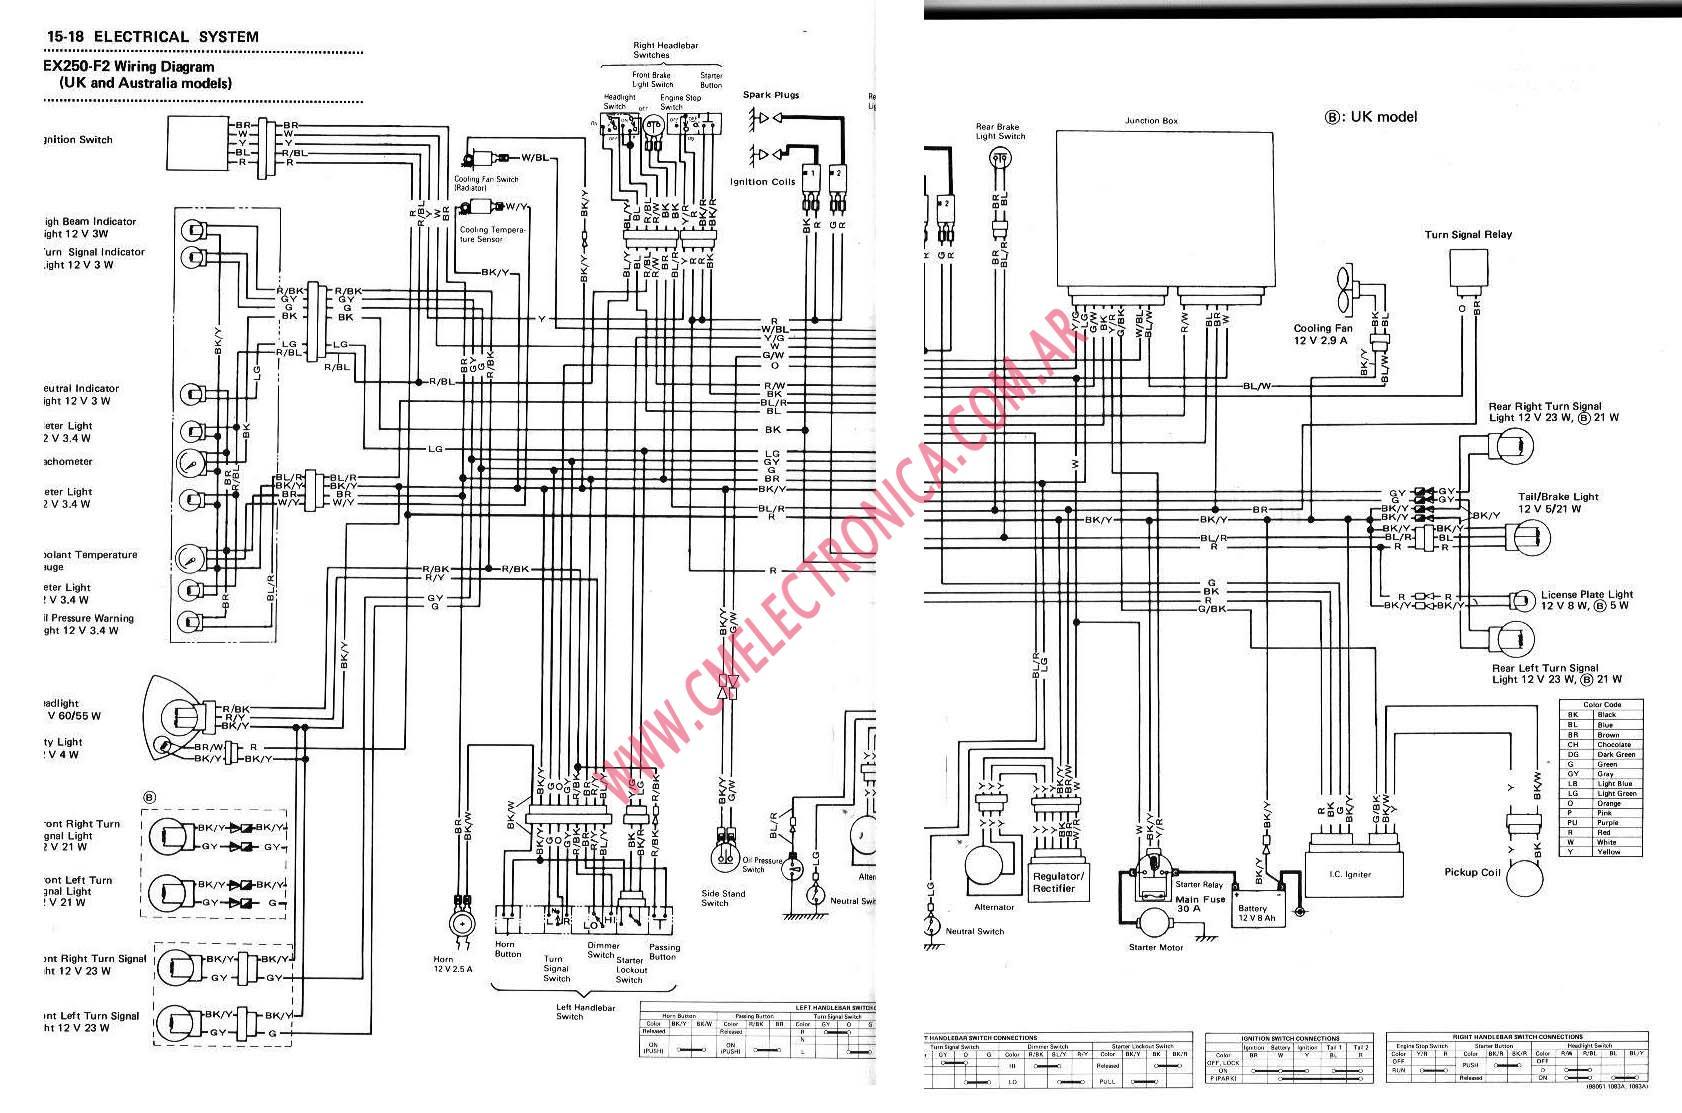 kawasaki gpx250?resize\\\\\\\\\\\\\\\\\\\\\\\\\\\\\\\=665%2C440 441035104b motorola wiring diagram,motorola \u2022 j squared co  at alyssarenee.co